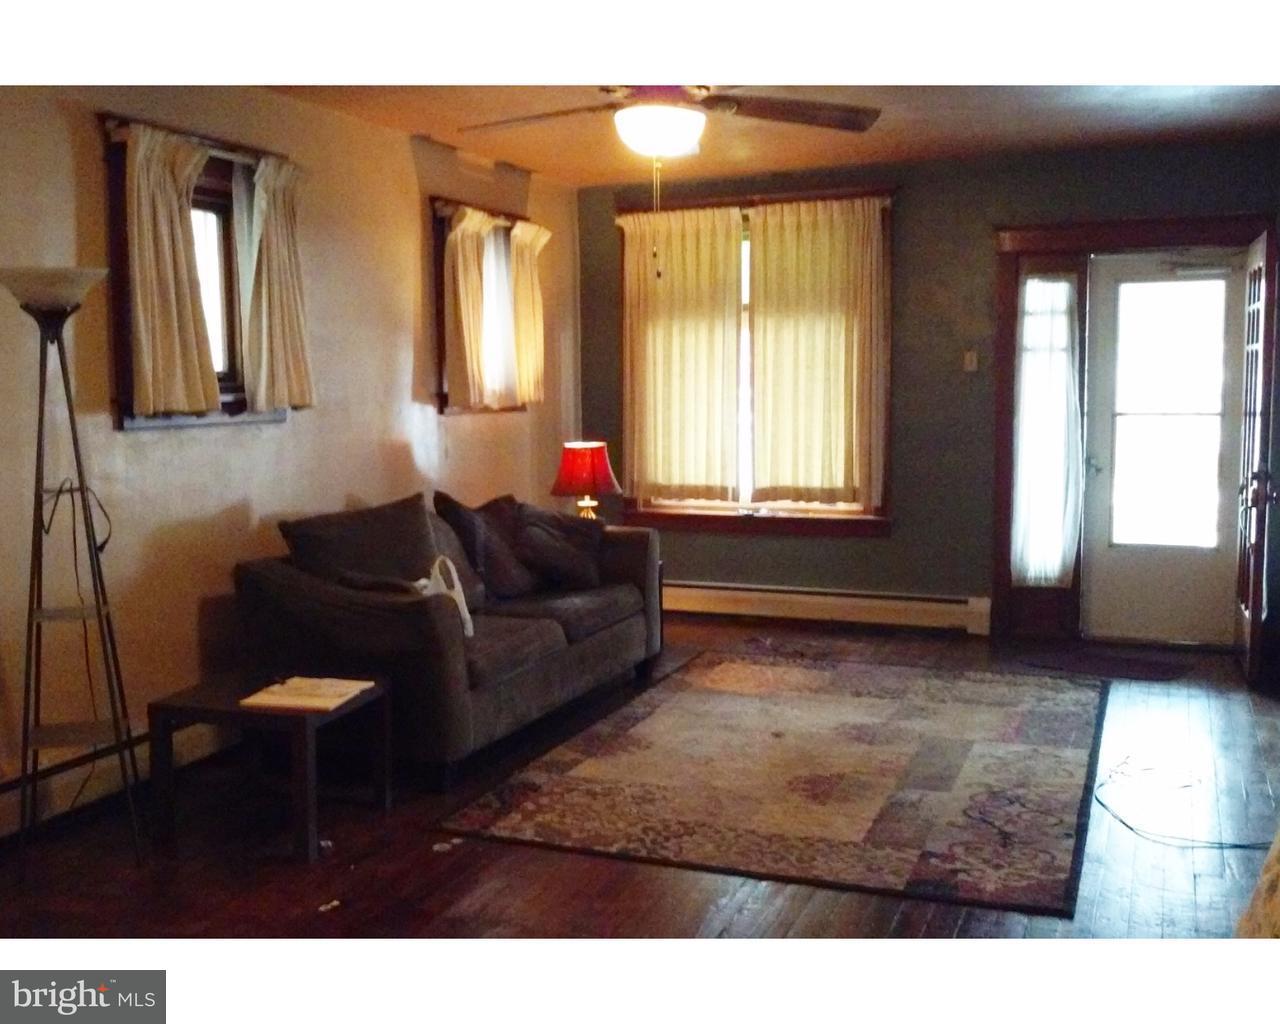 126 S FRANKLIN ST, BOYERTOWN - Listed at $89,900, BOYERTOWN